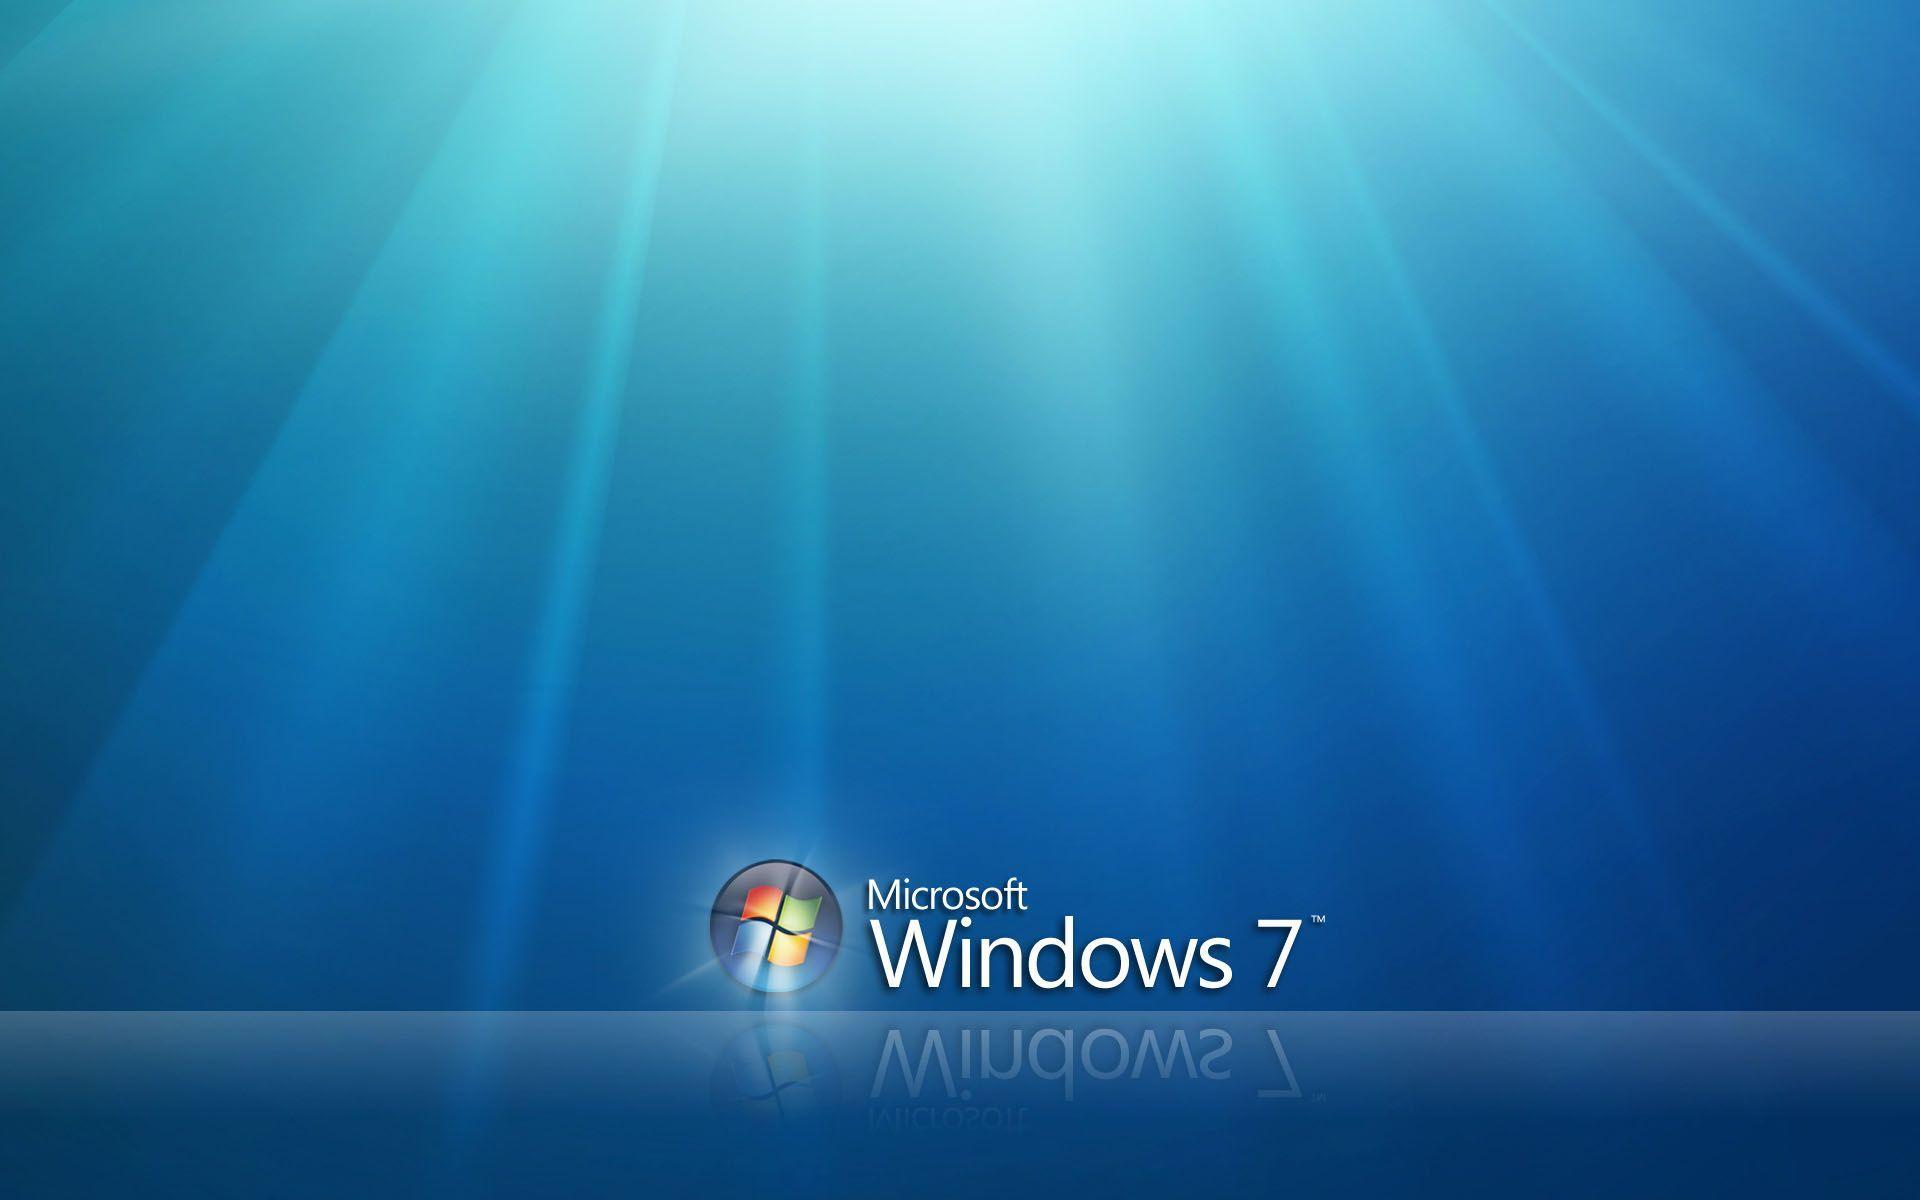 Download Wallpapers Windows 7 4k Se7en Blue Background: Microsoft Windows 7 Desktop Backgrounds